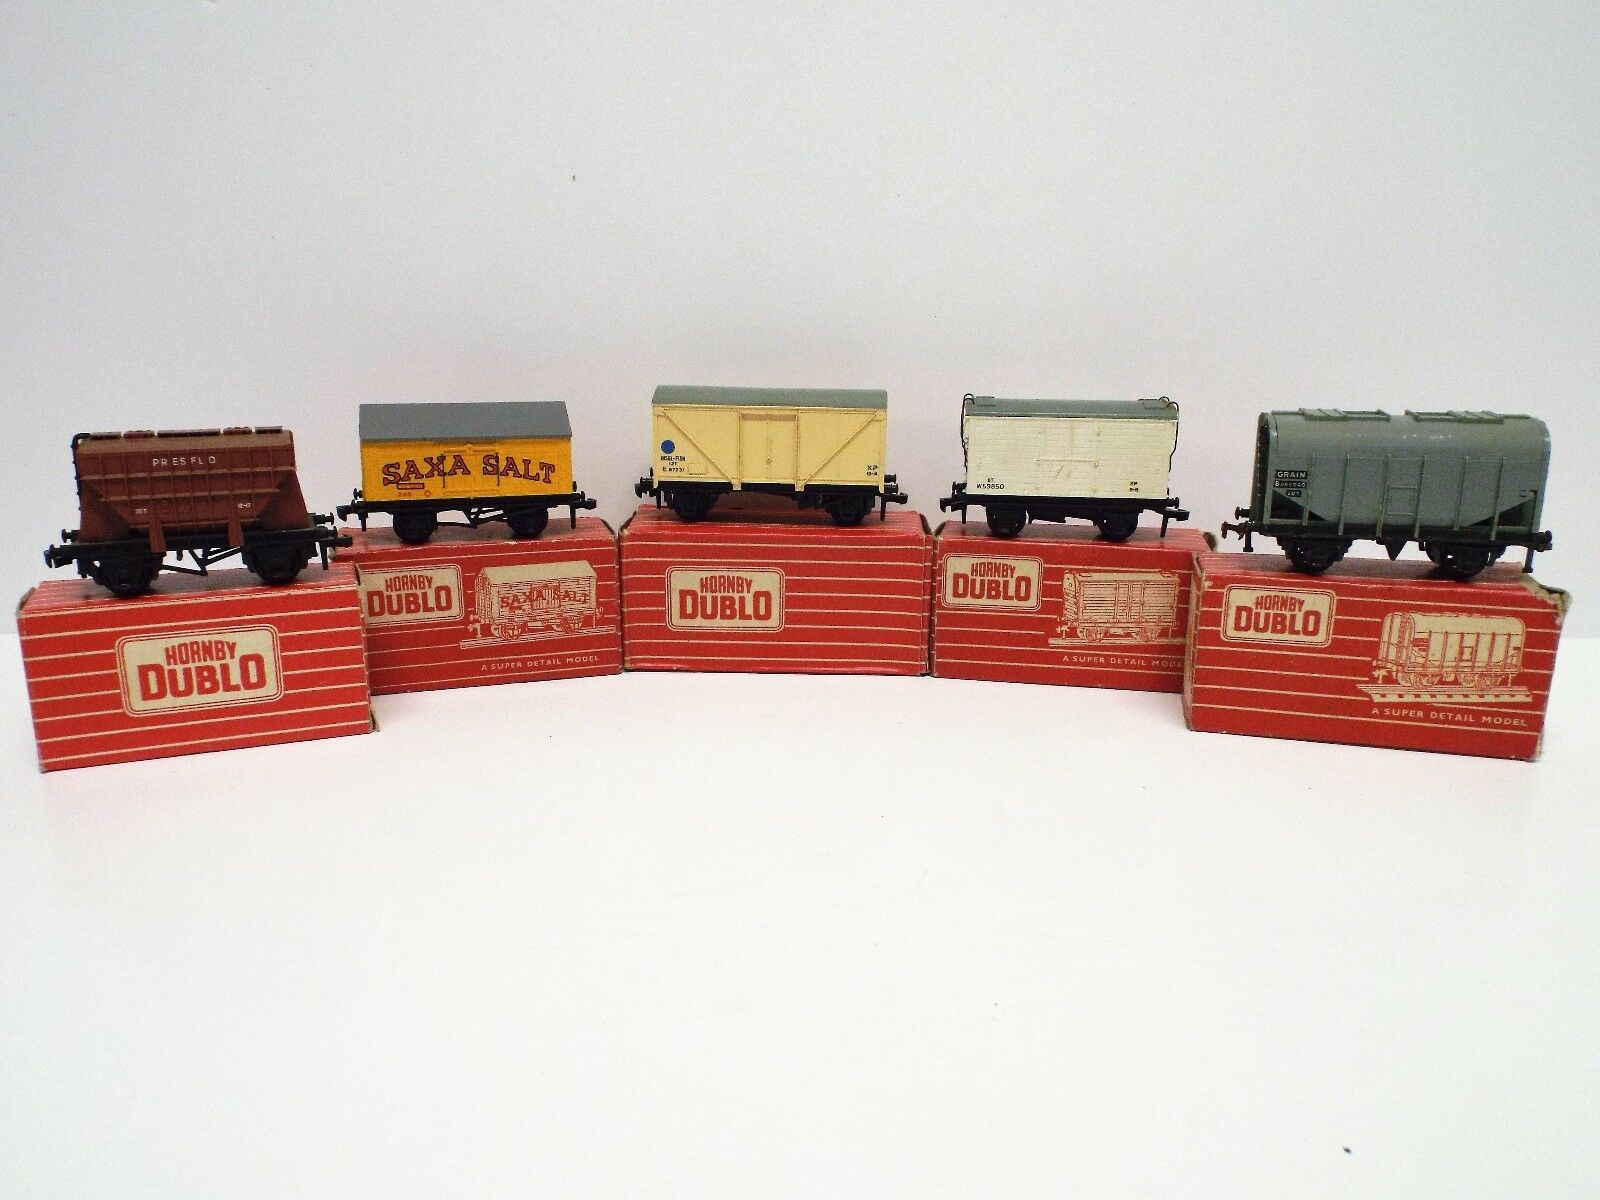 HORNBY DUBLO 2 3-RAIL JOB LOT OF 5 X WAGONS ALL BOXED (C381)